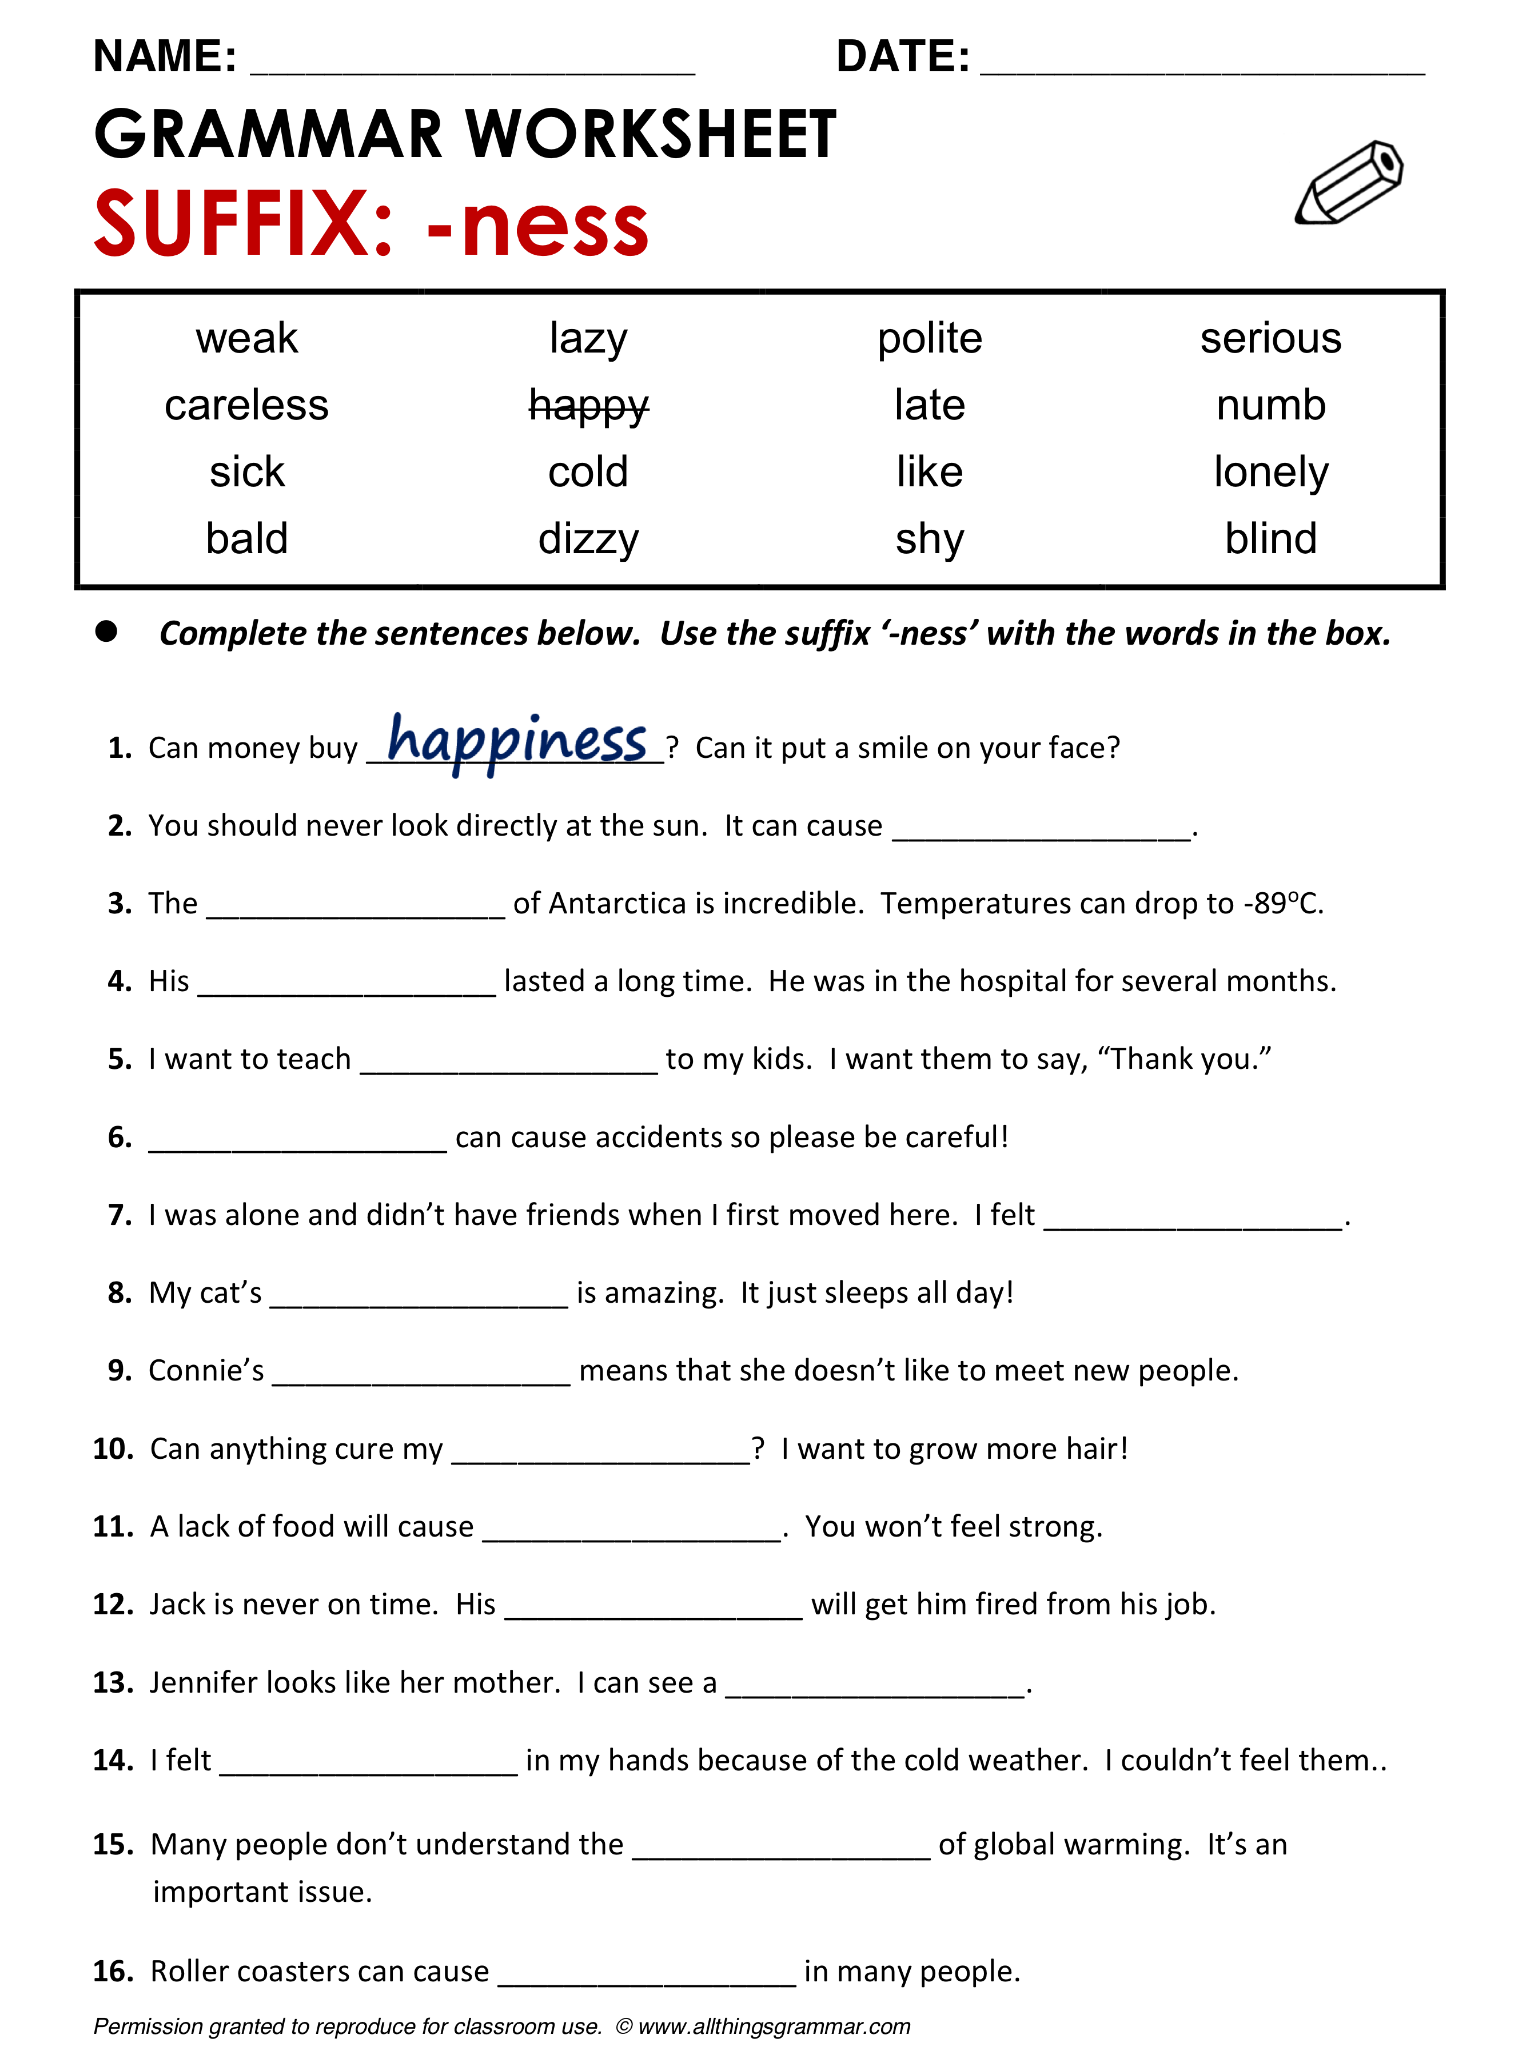 medium resolution of English Grammar Suffix: -ness www.allthingsgrammar.com/suffix--ness.html    English grammar worksheets